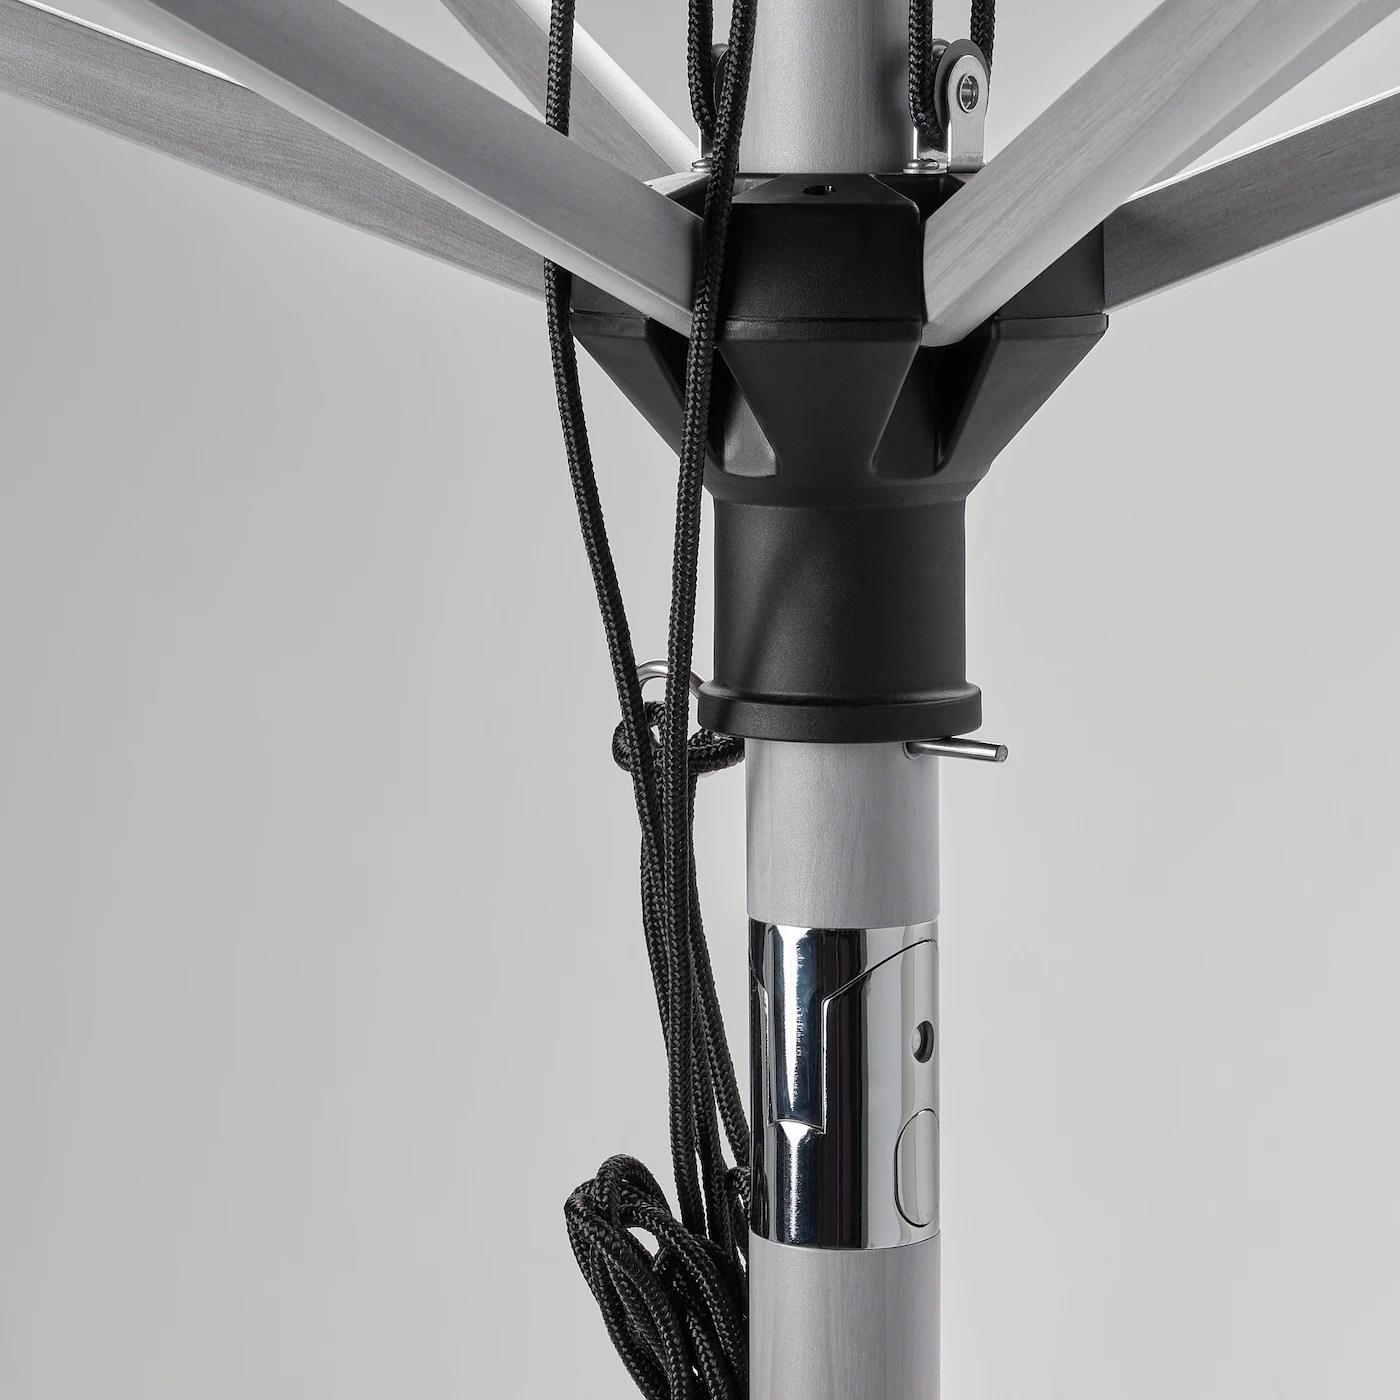 betso lindoja patio umbrella with base gray wood effect beige green gryto dark gray 118 1 8 300 cm